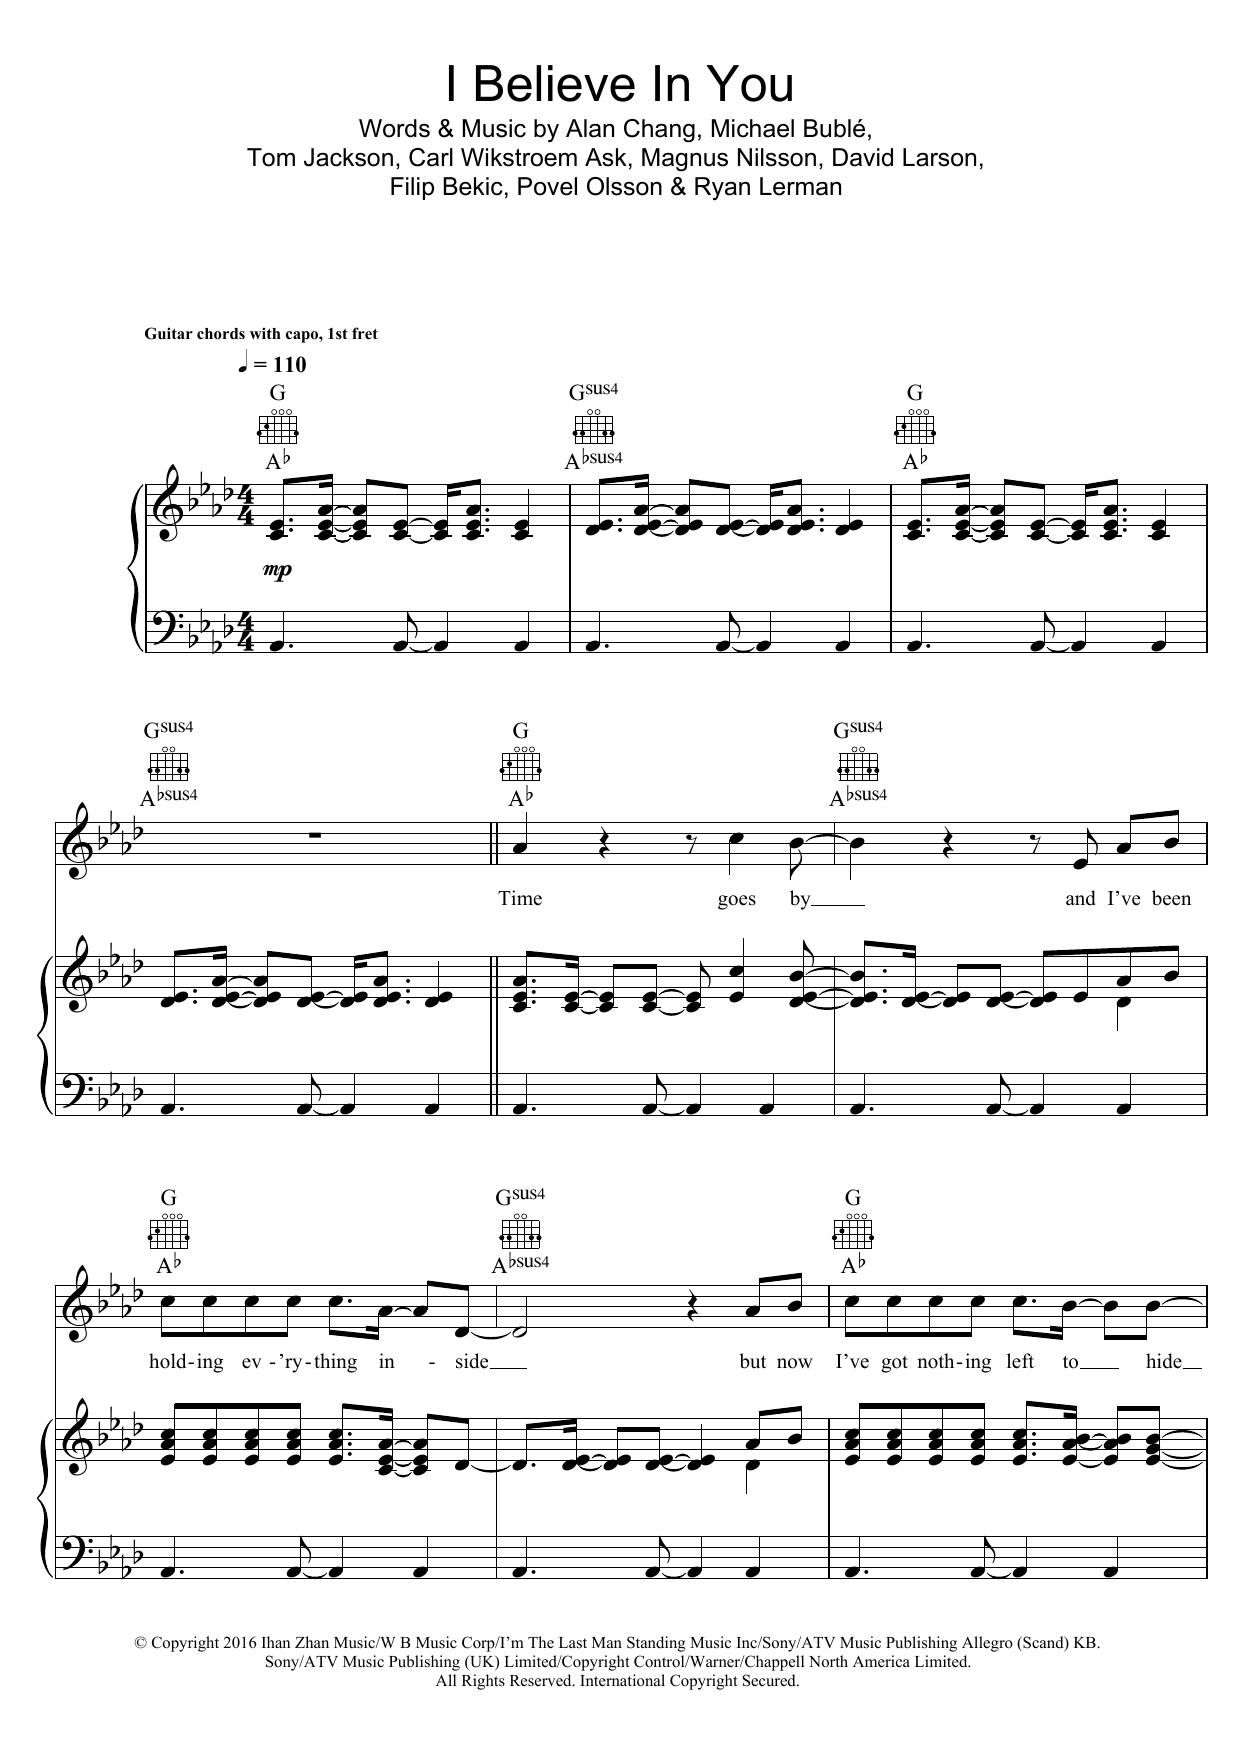 Sheet Music Digital Files To Print Licensed Michael Buble Digital